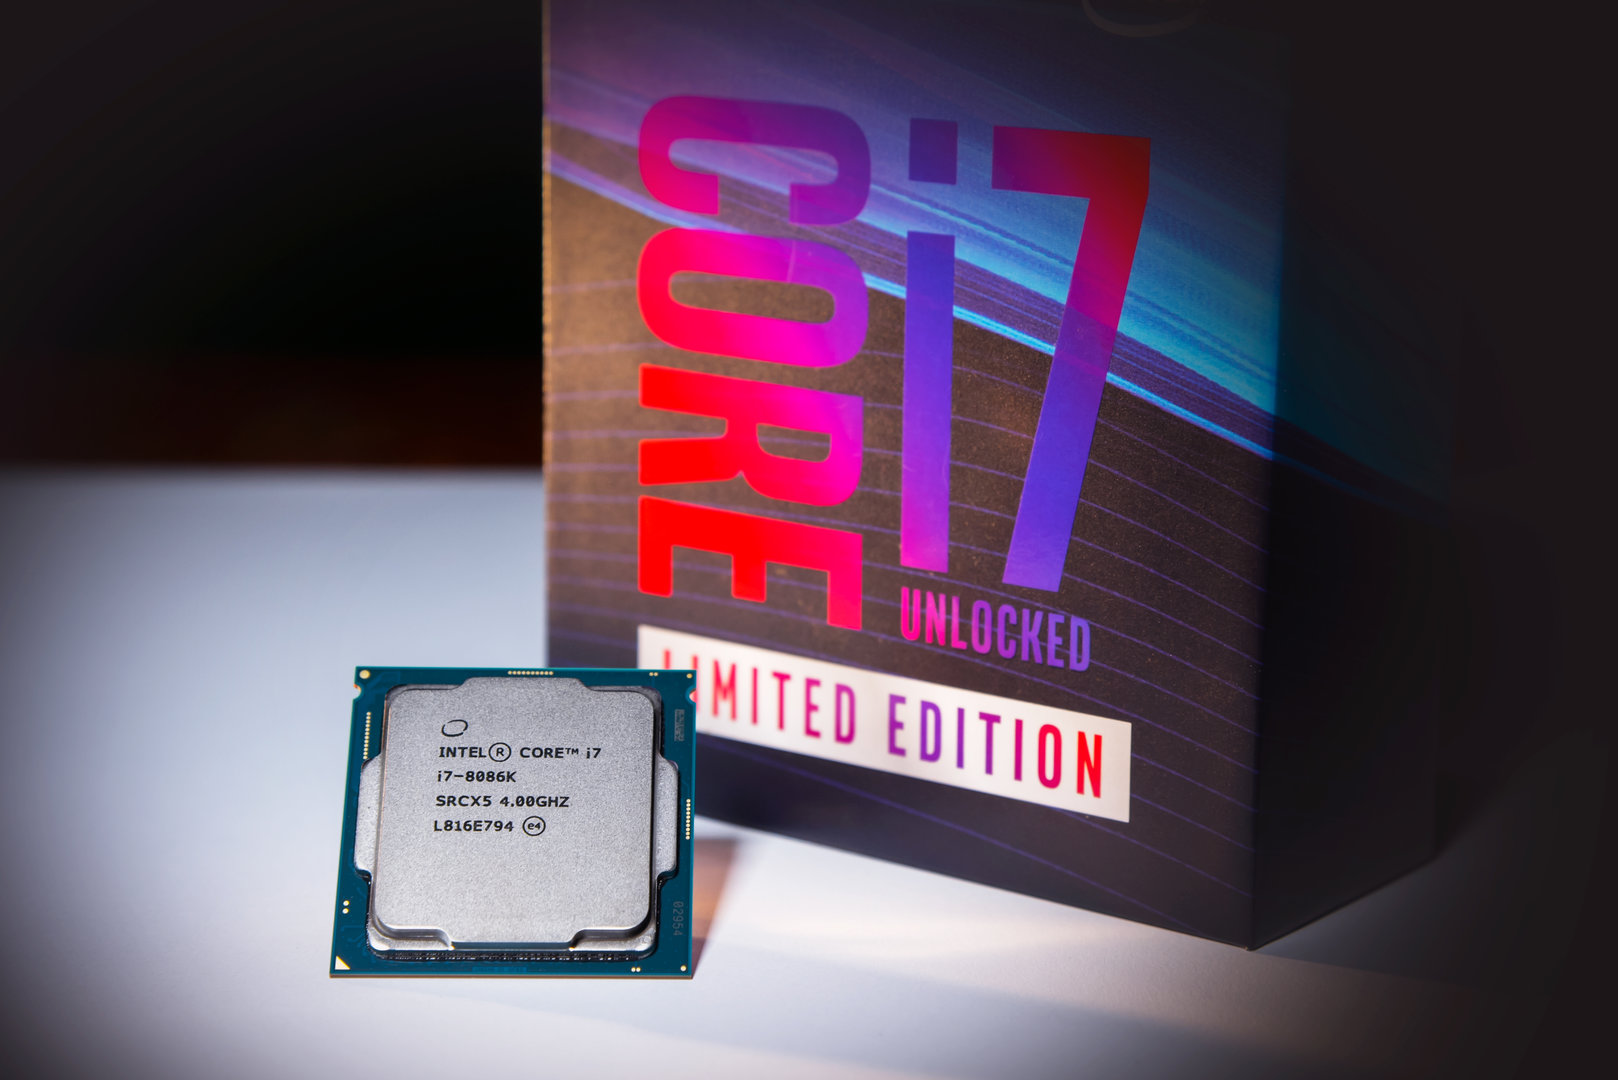 Intel Core i7-8086K Limited Edition